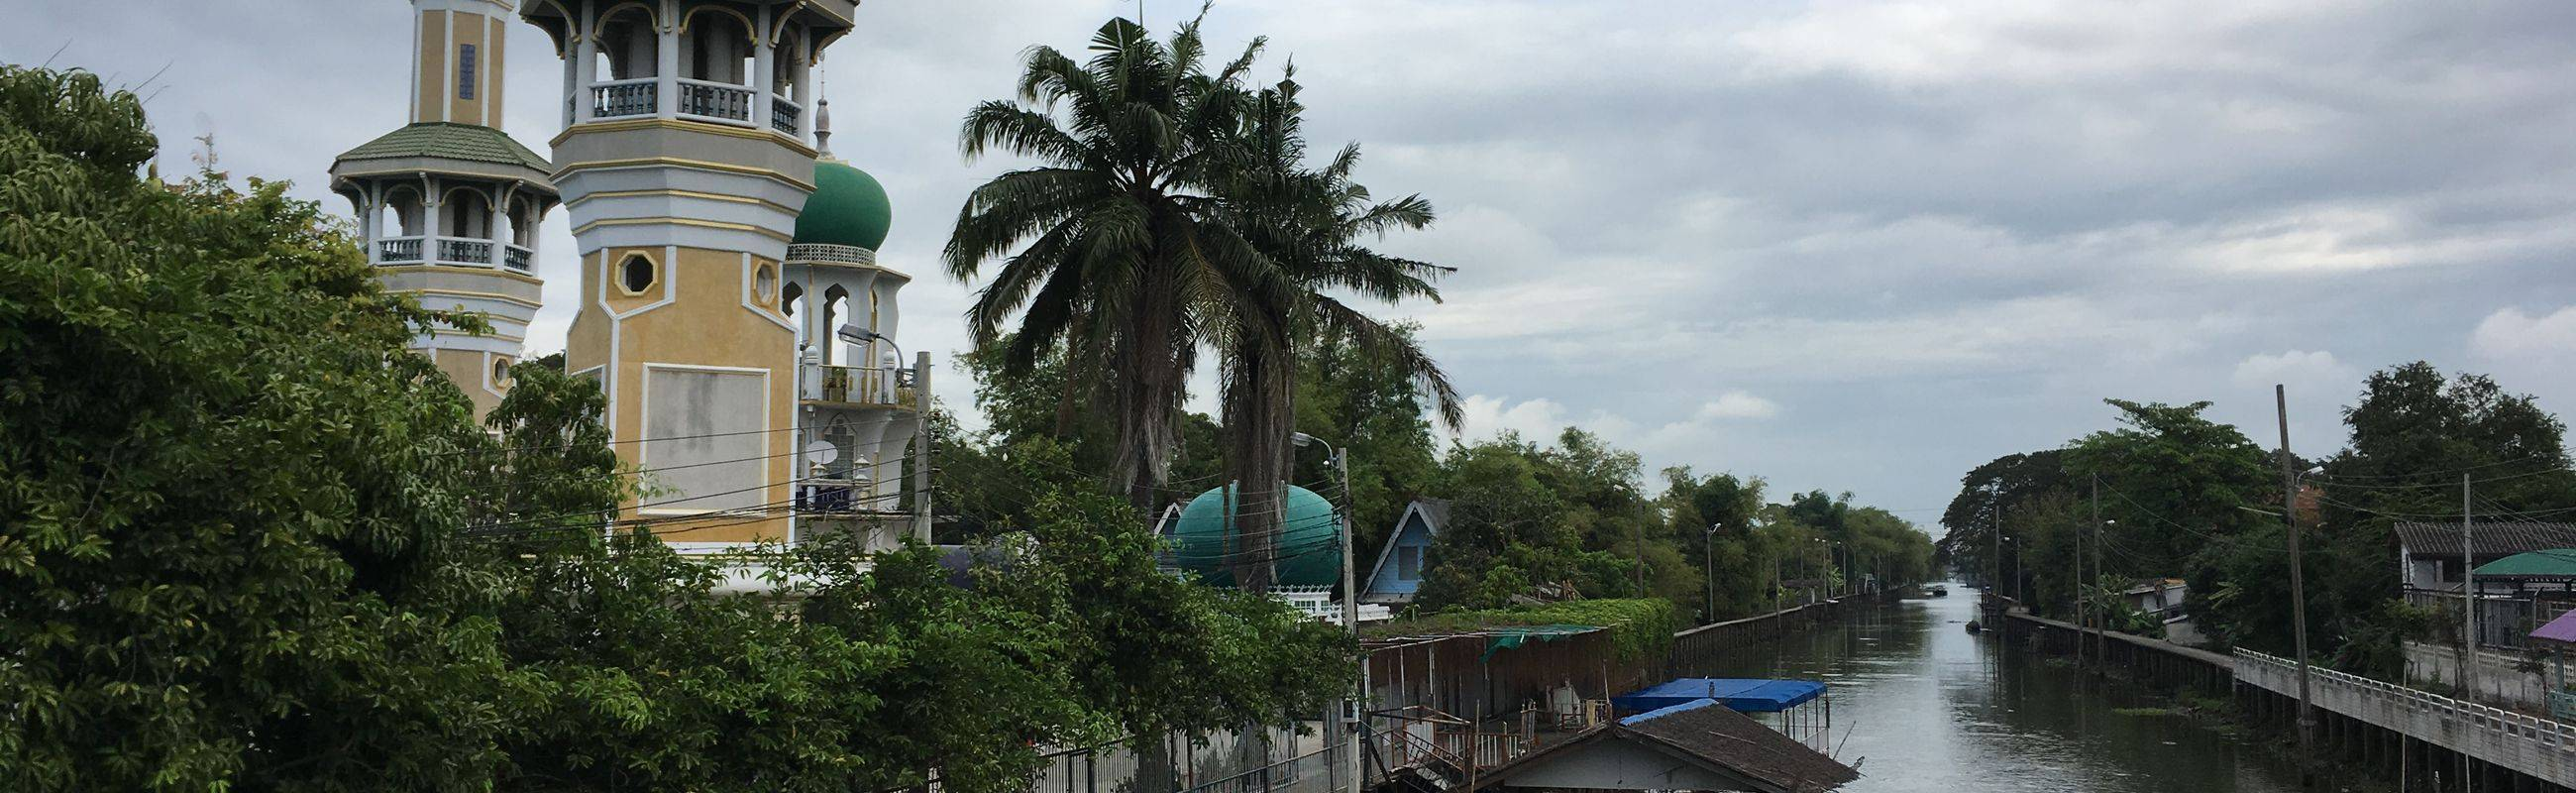 Boating & Halal Street Food in Bangkok Muslim Community